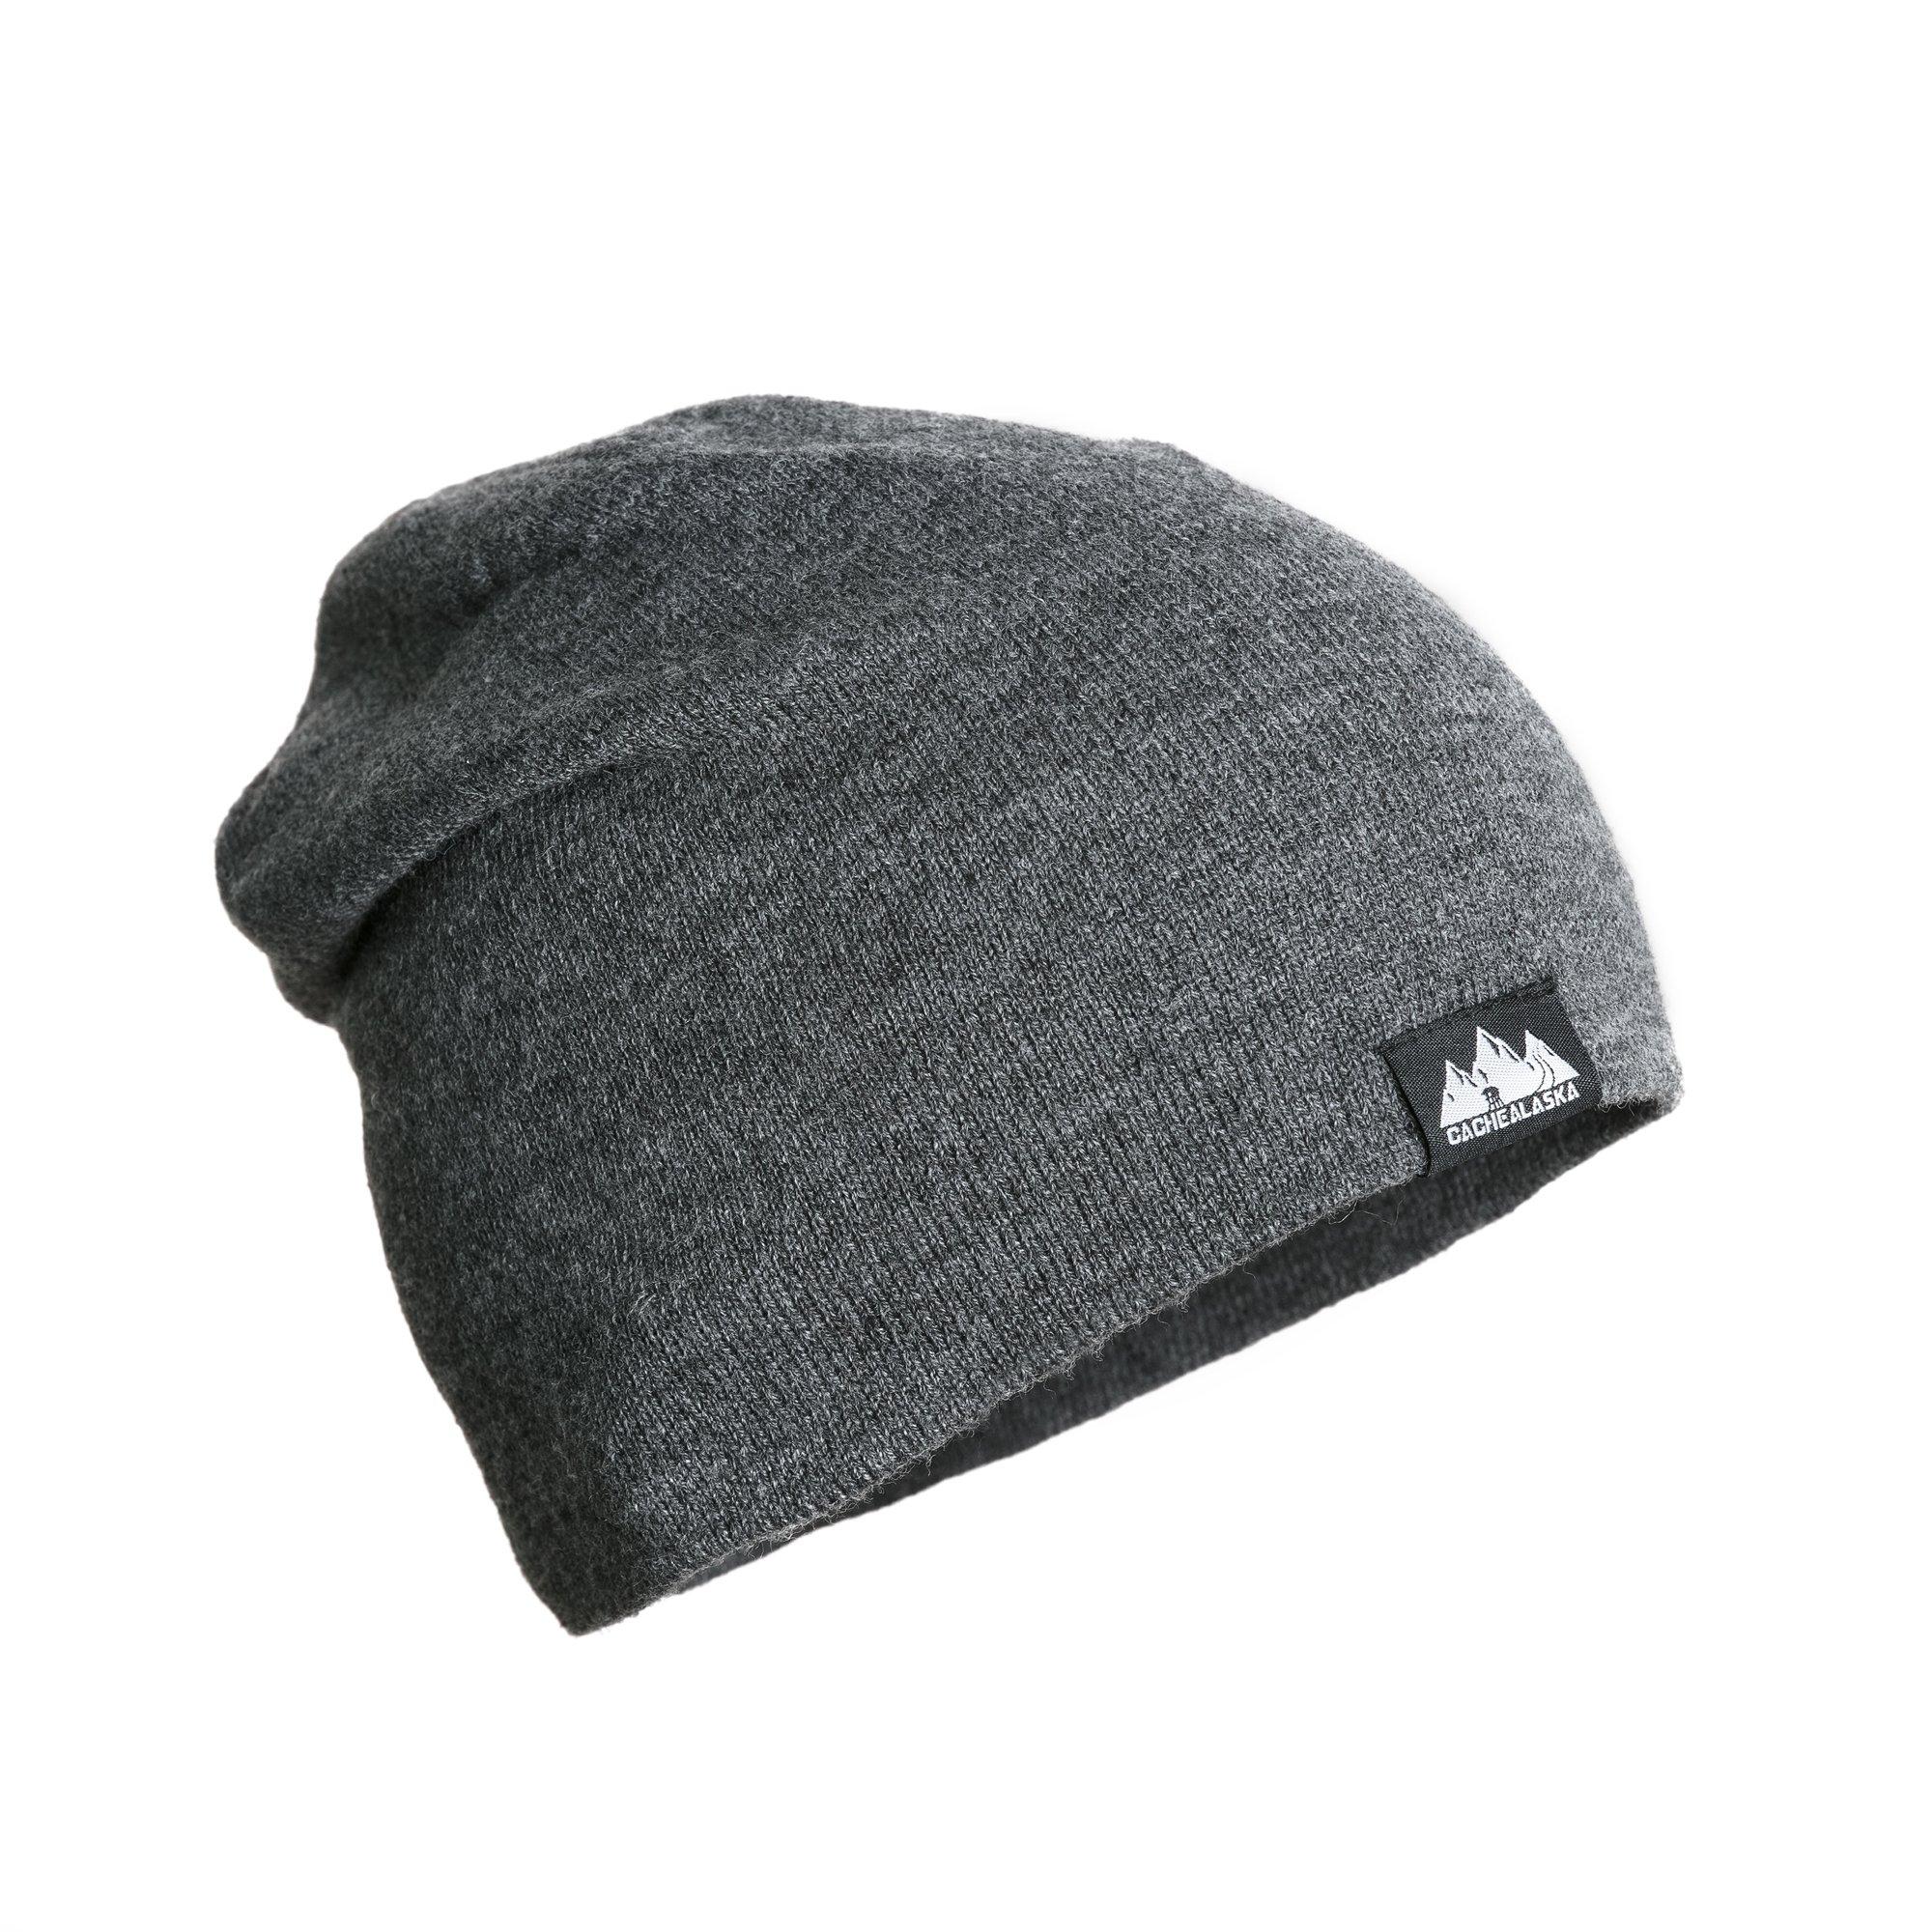 CacheAlaska - Slouchy Beanie - Cuff Skull Cap - Premium Knit hat for Men or Women - Grey